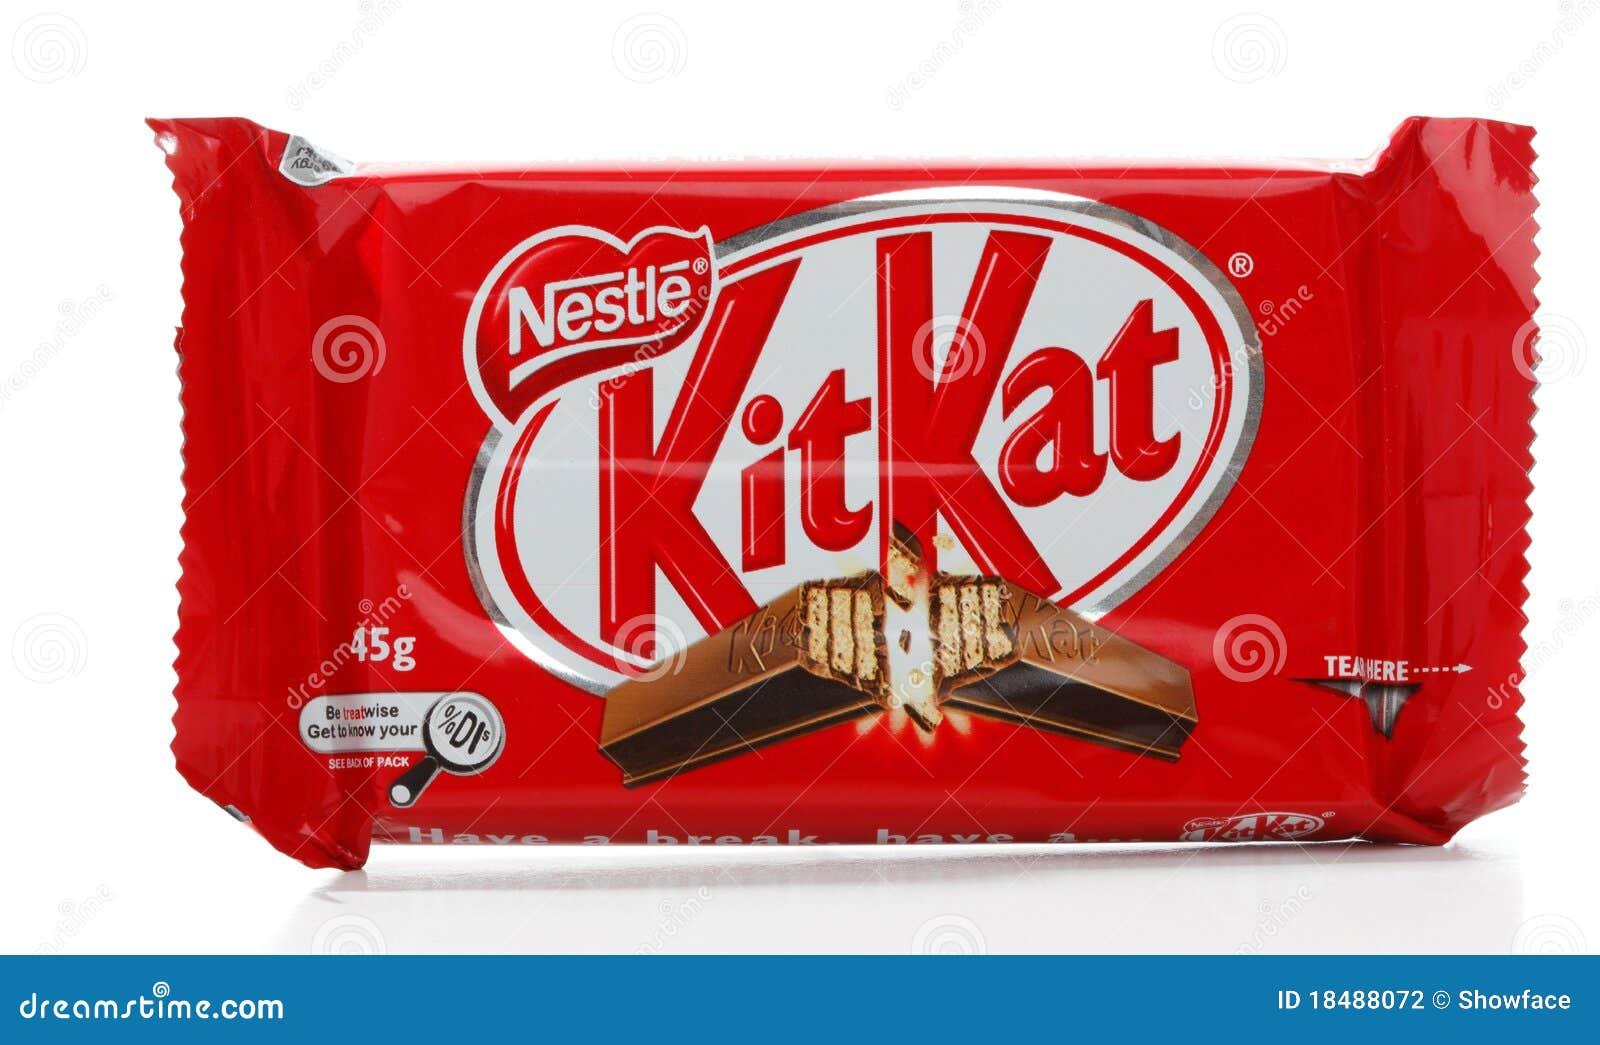 nestle kit kat chocolate bar editorial photography image of